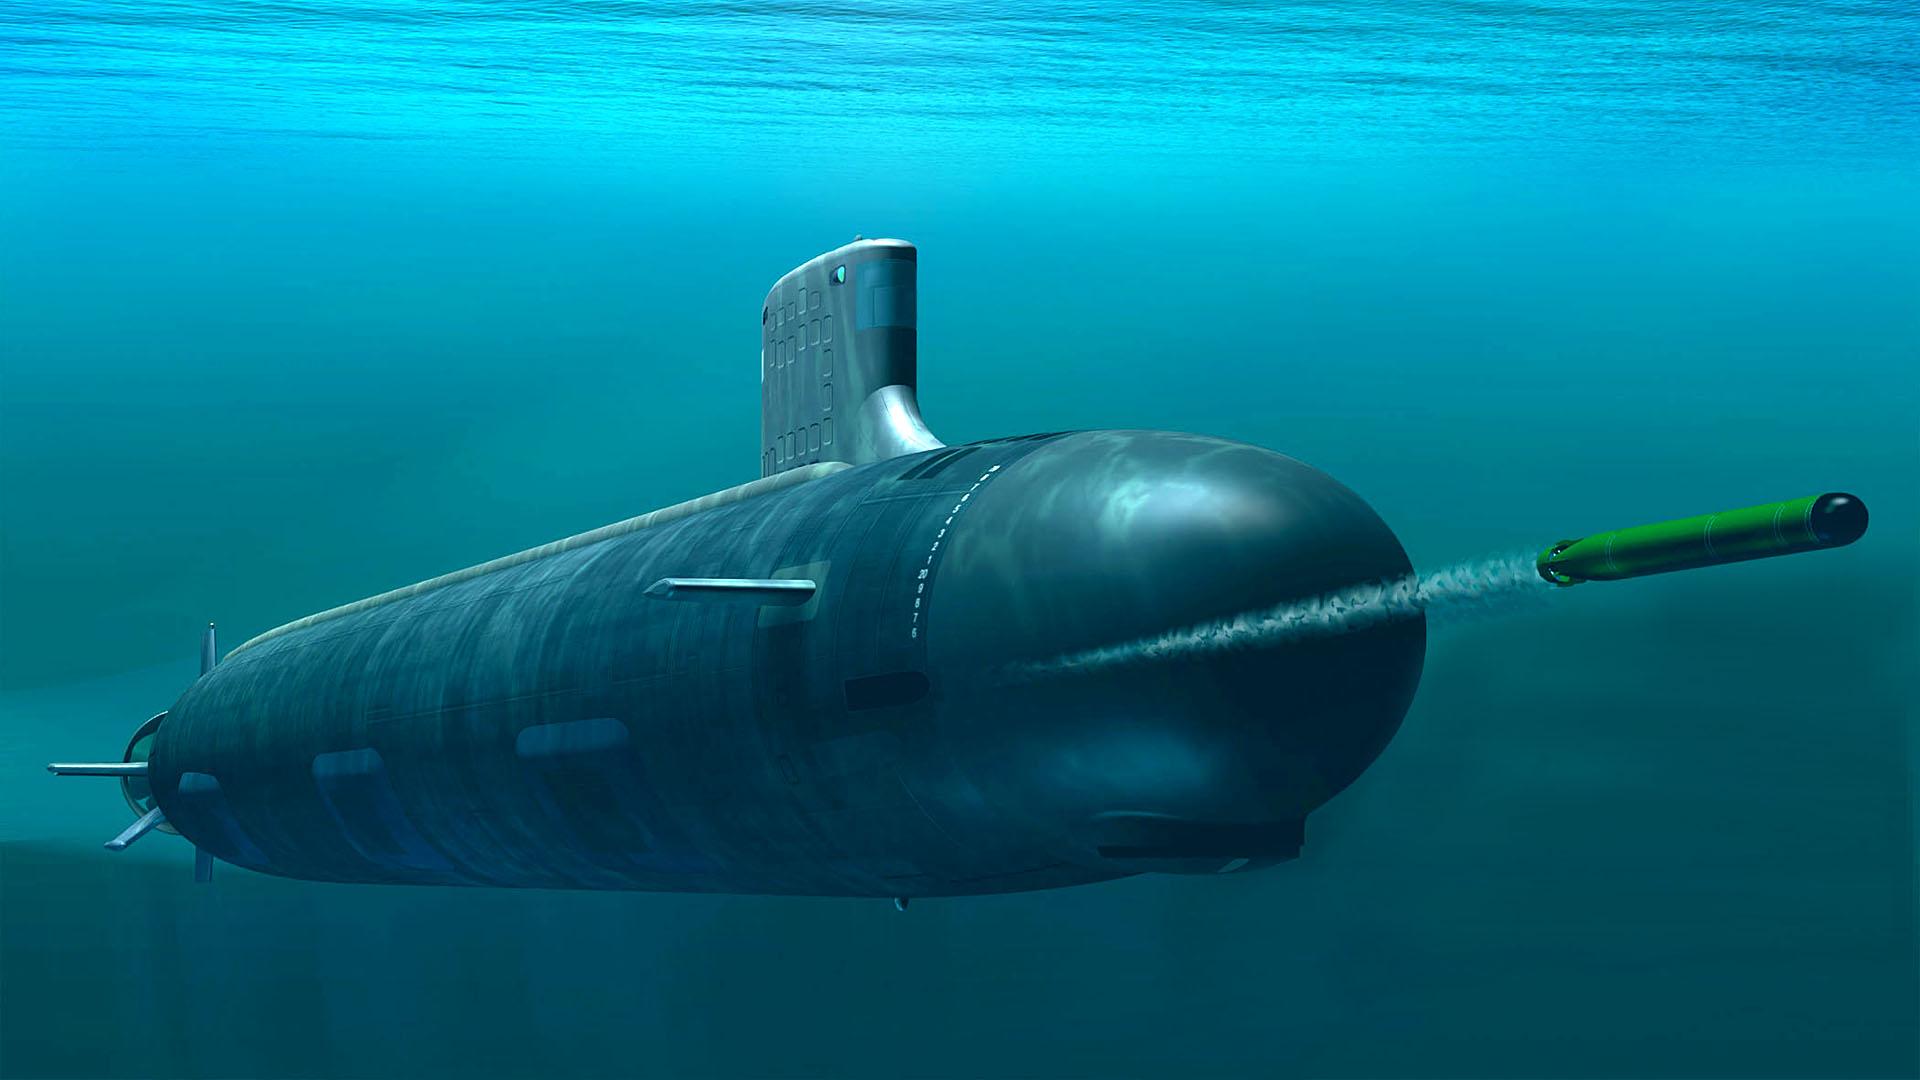 Military   Submarine Wallpaper 1920x1080